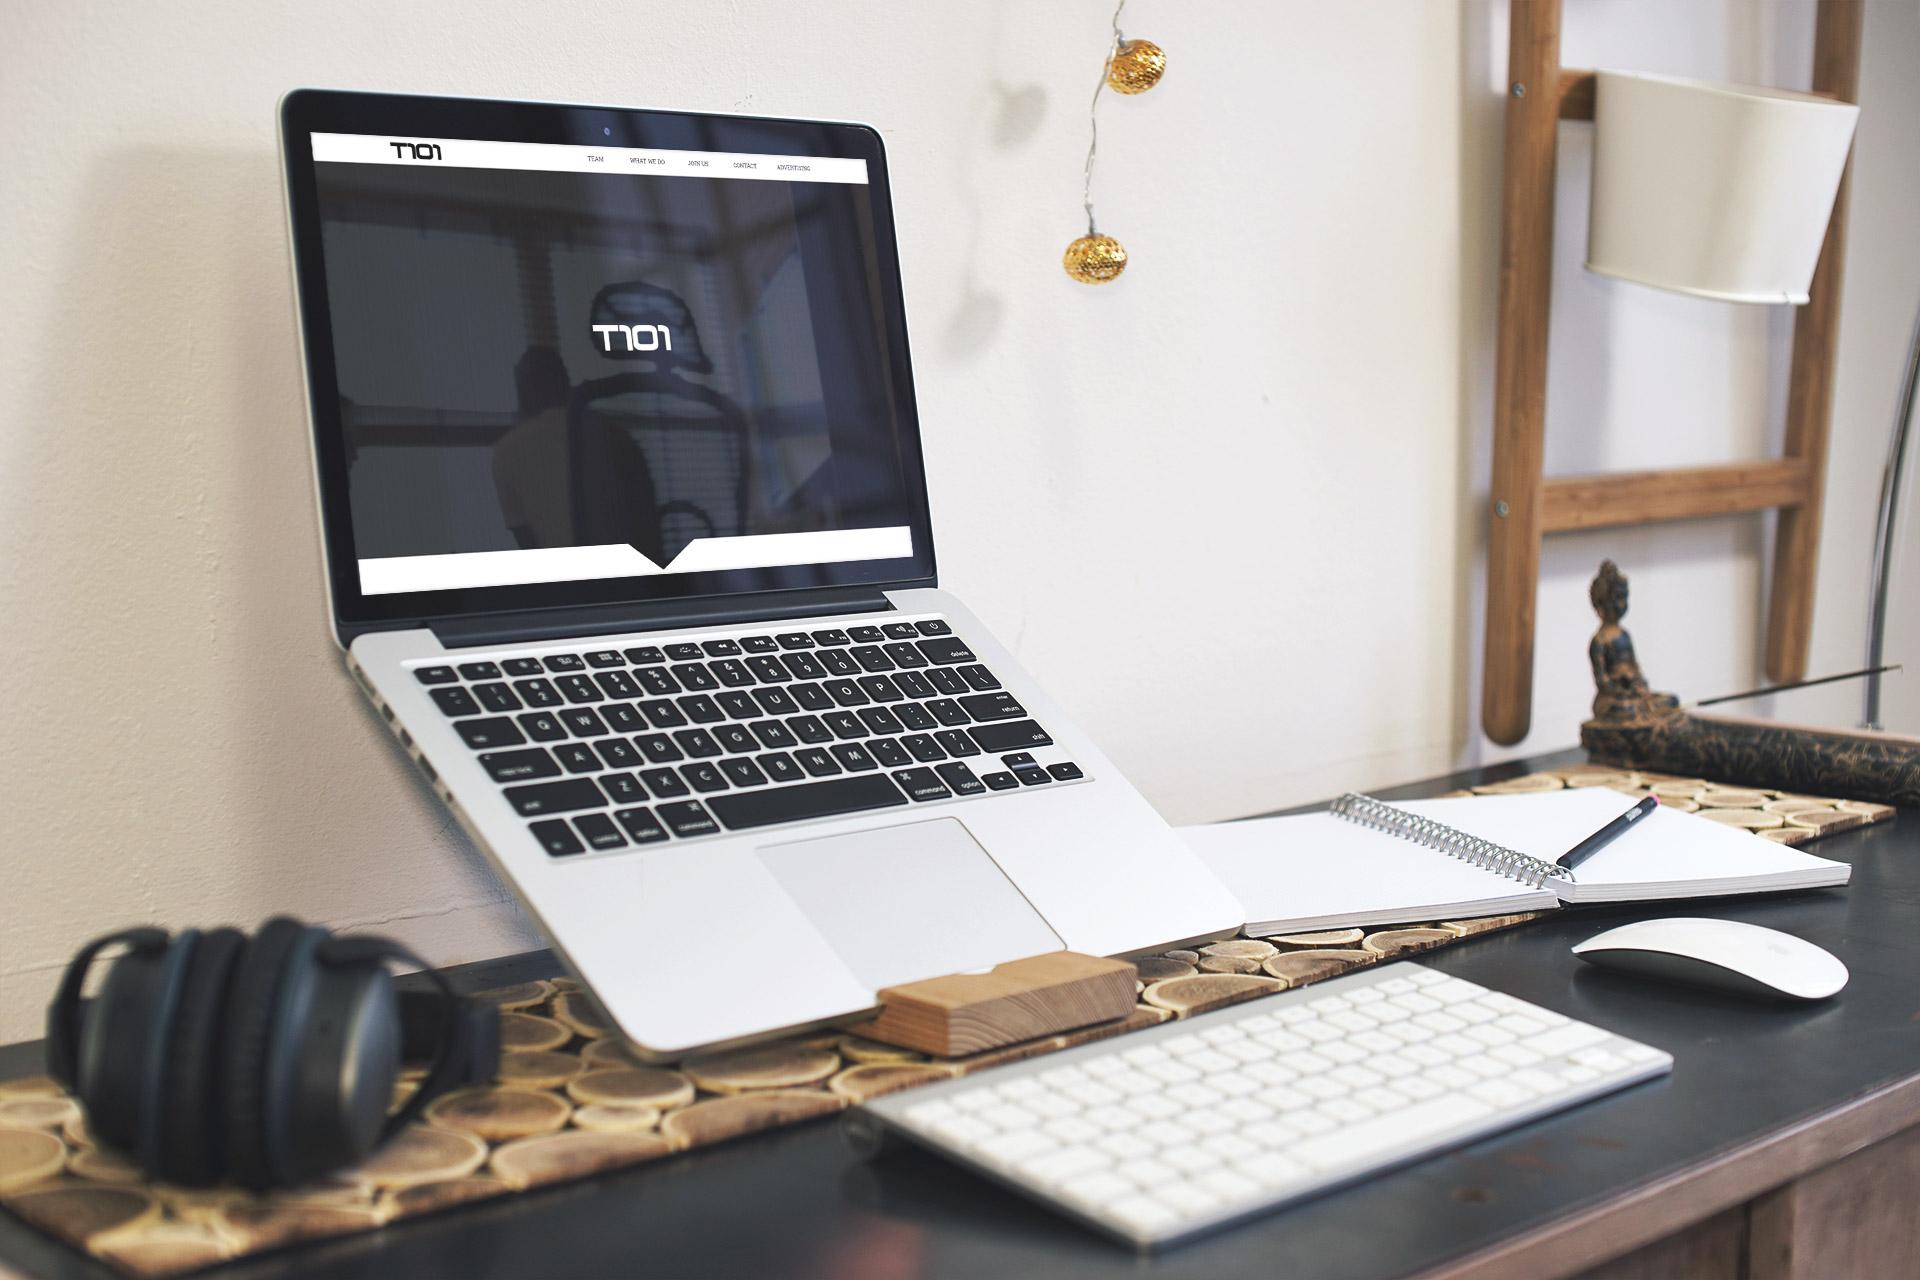 marketing to china - t101 website laptop